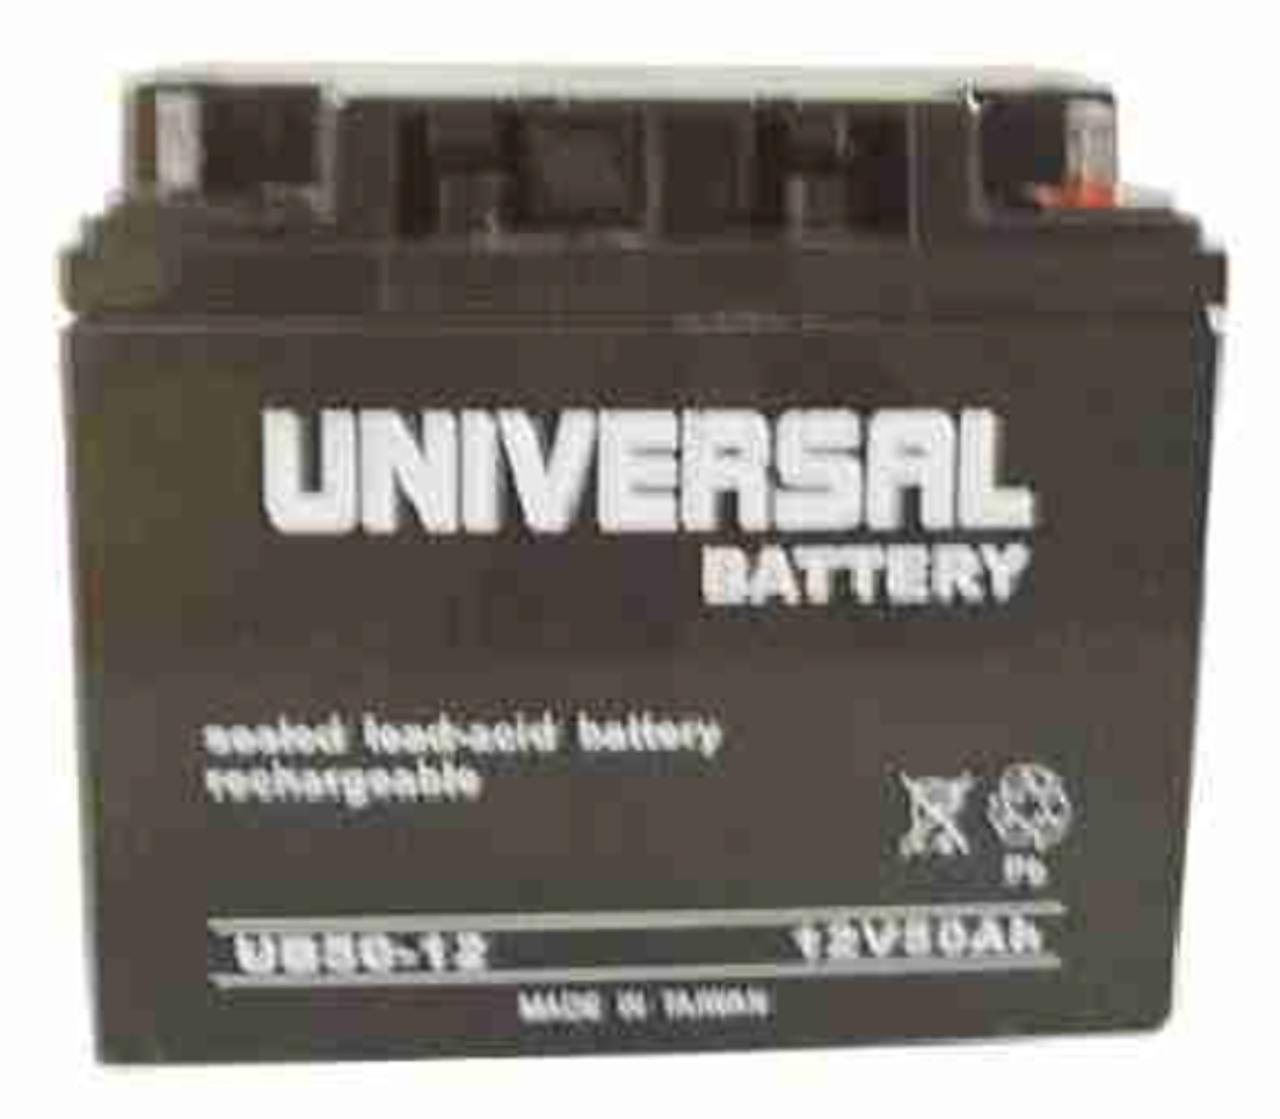 Universal Battery UB12500 12V, 50Ah (20HR) Sealed AGM